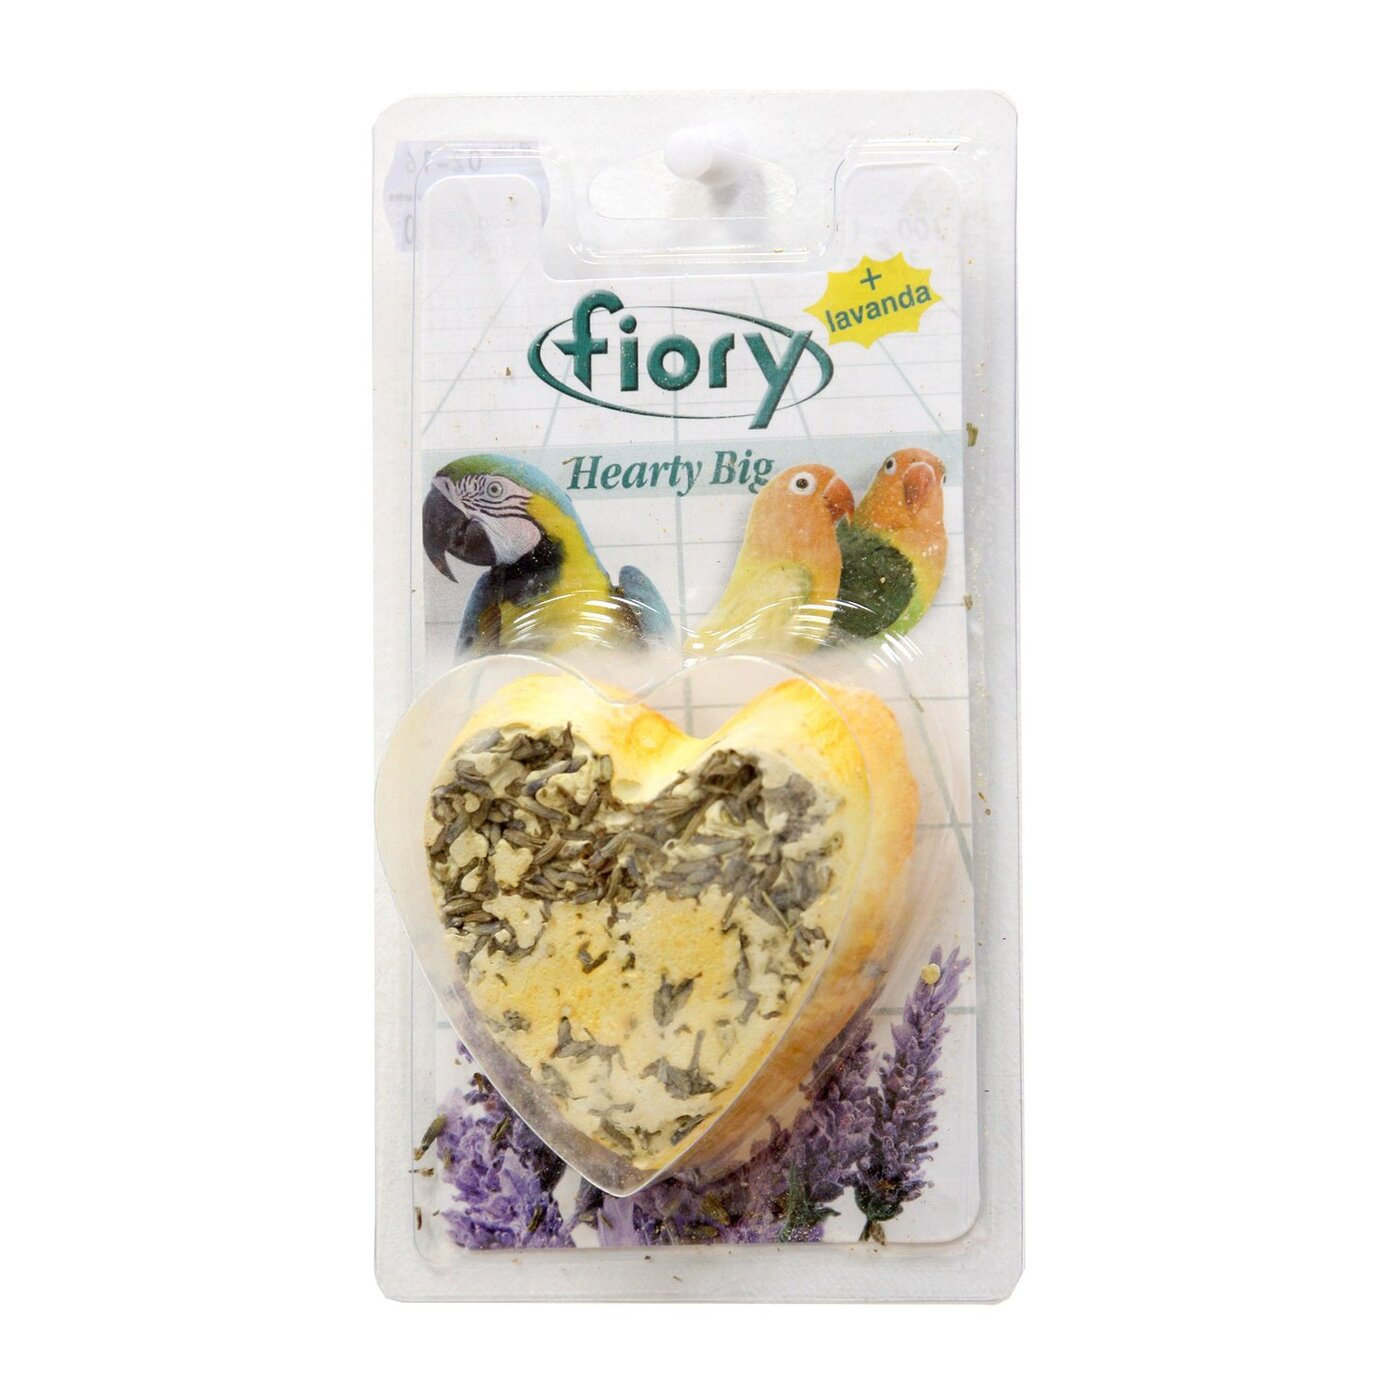 Fiory Hearty био-камень для птиц, с лавандой 45 гр